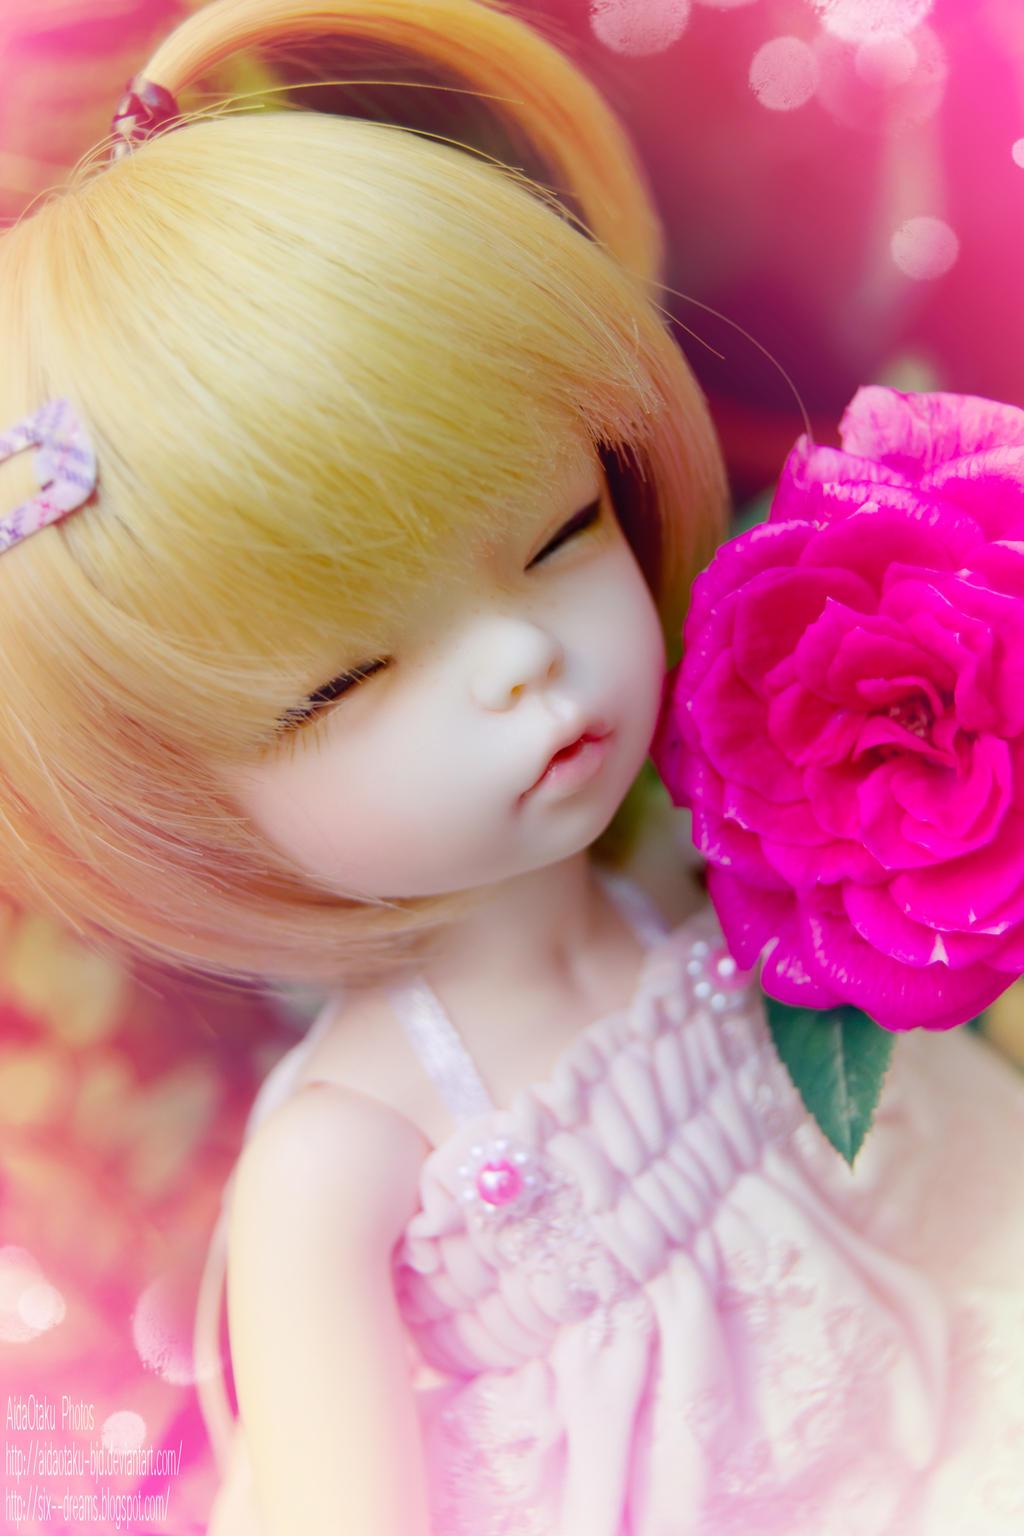 Sleeping rose by AidaOtaku-BJD